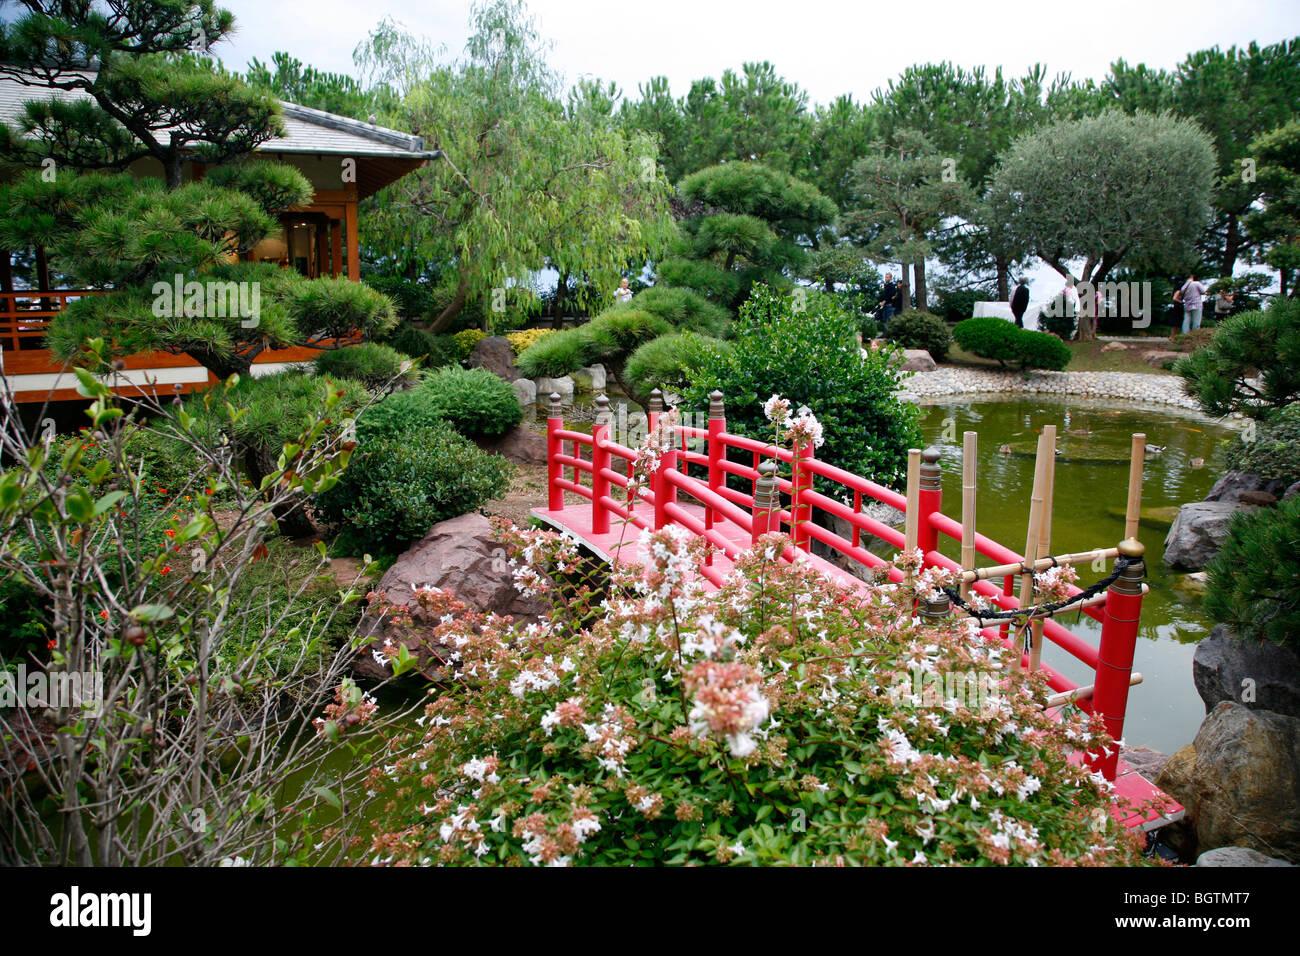 Jardin Japonais, the Japanese Gardens in Monte Carlo, Monaco Stock ...